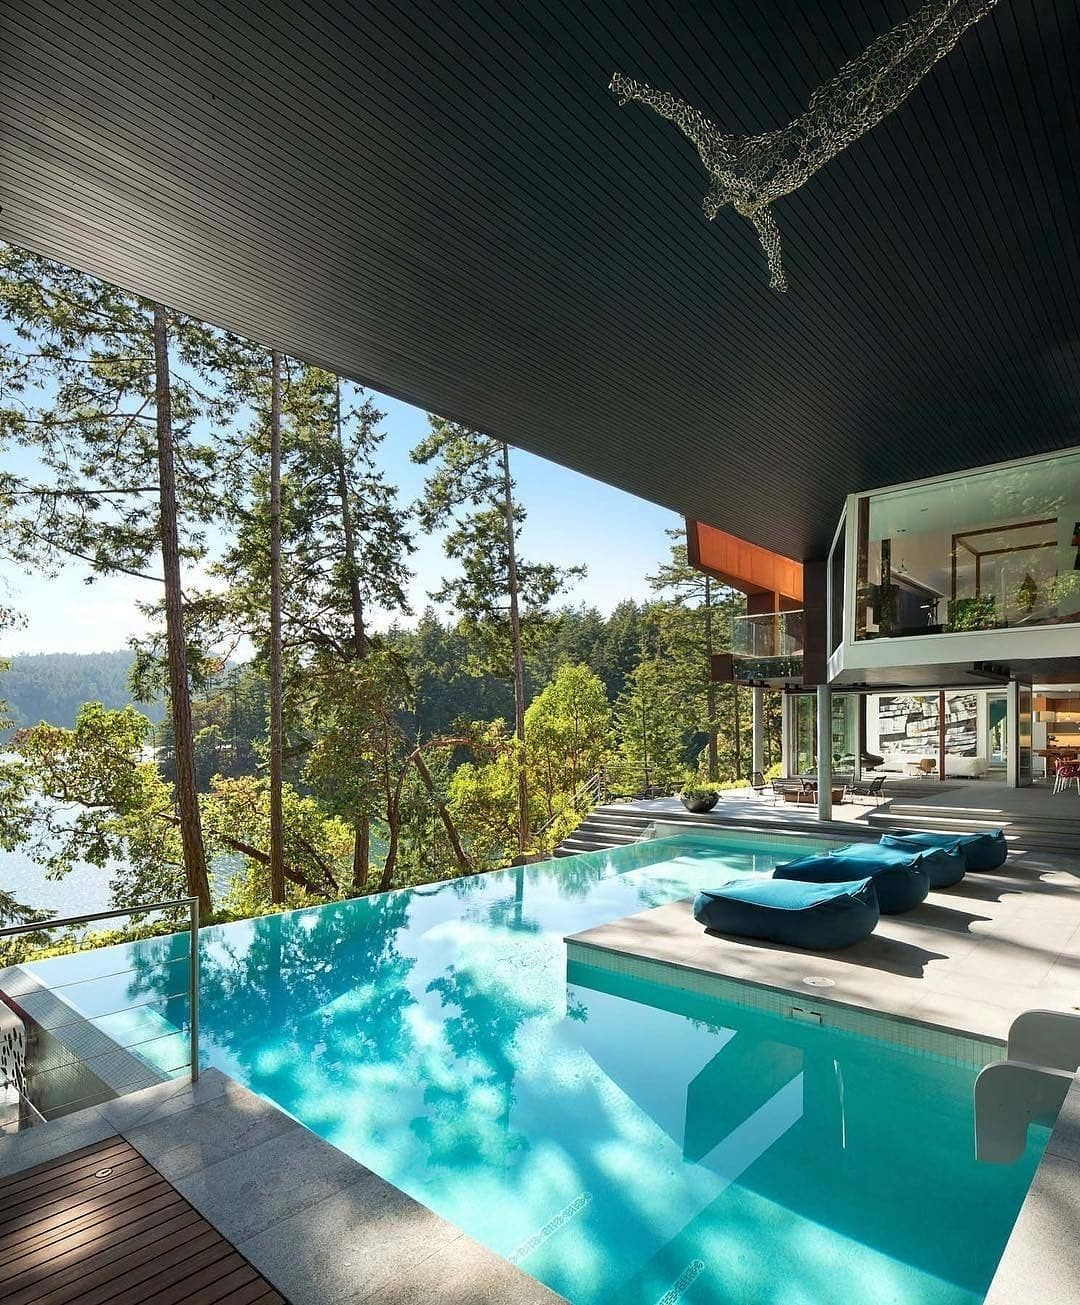 Tag A Friend Indoor Pool Design Indoor Swimming Pool Design Luxury Pools